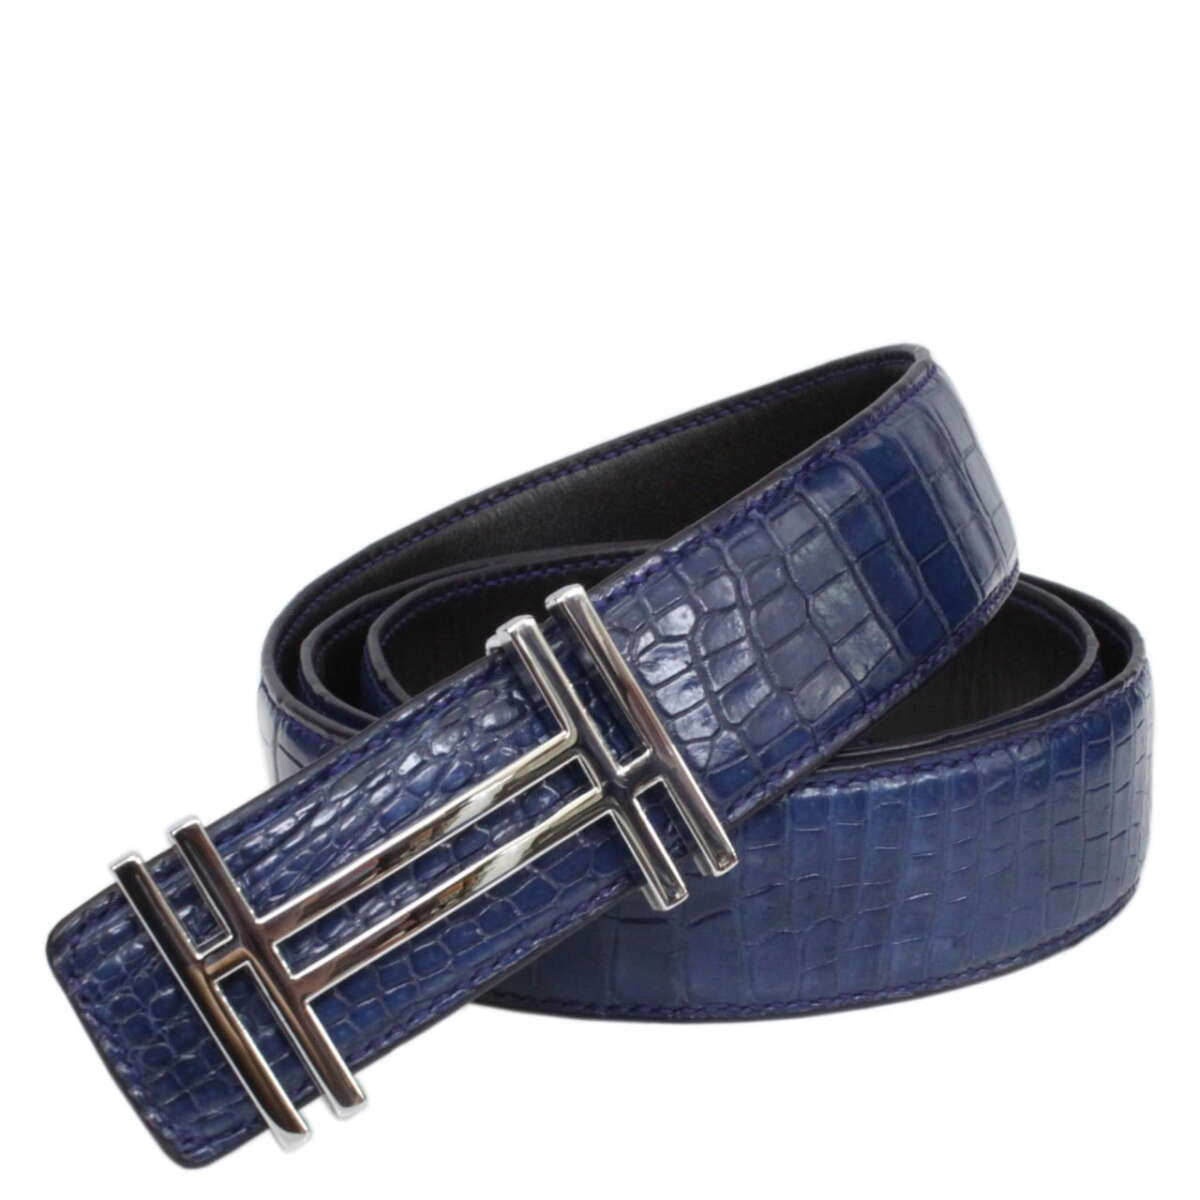 Hand-sewn crocodile leather belt S616a